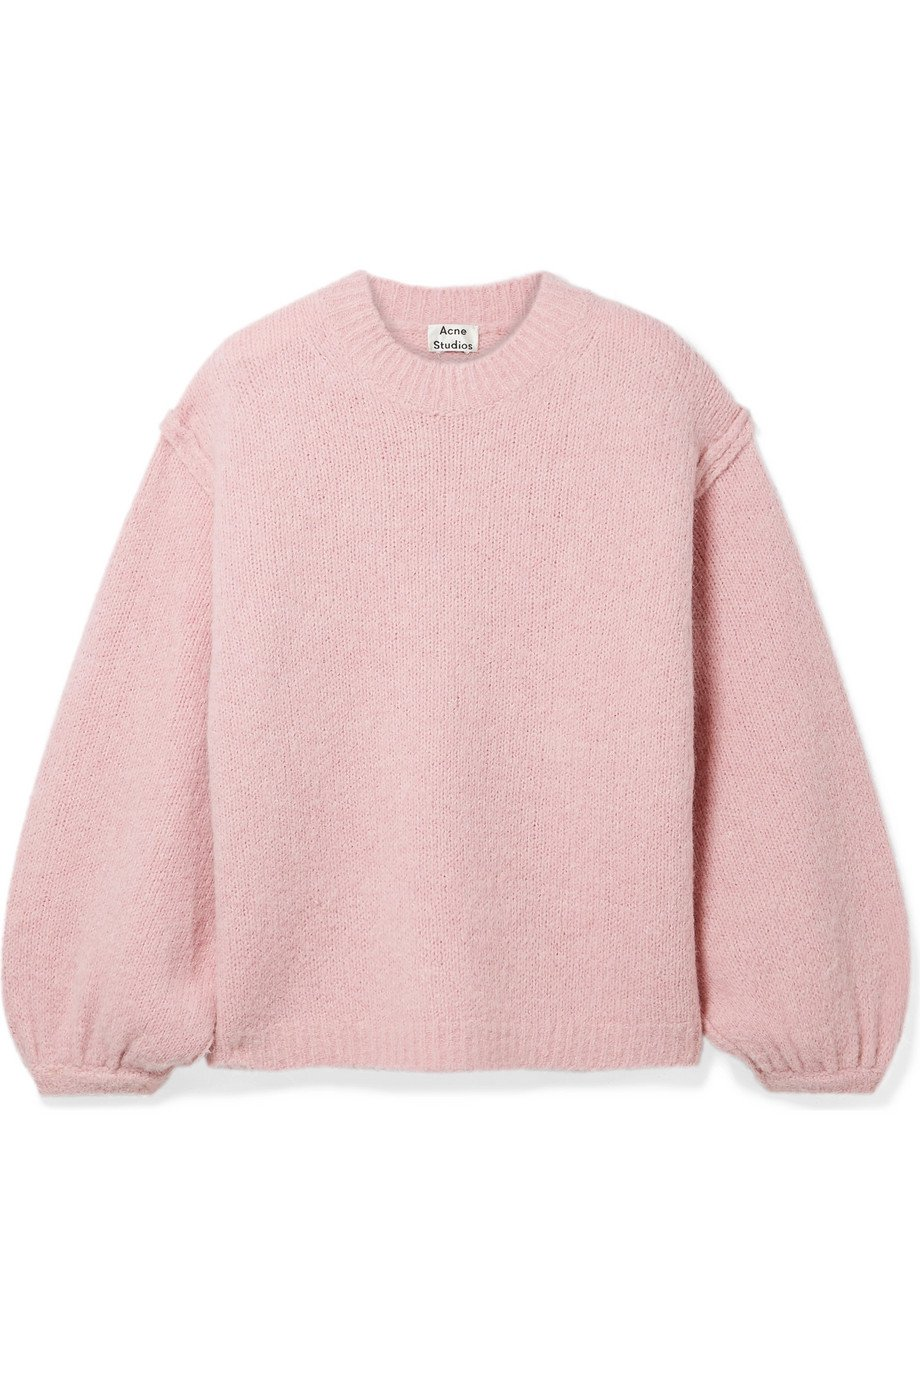 Acne Studios | Kiara oversized knitted sweater | NET-A-PORTER.COM